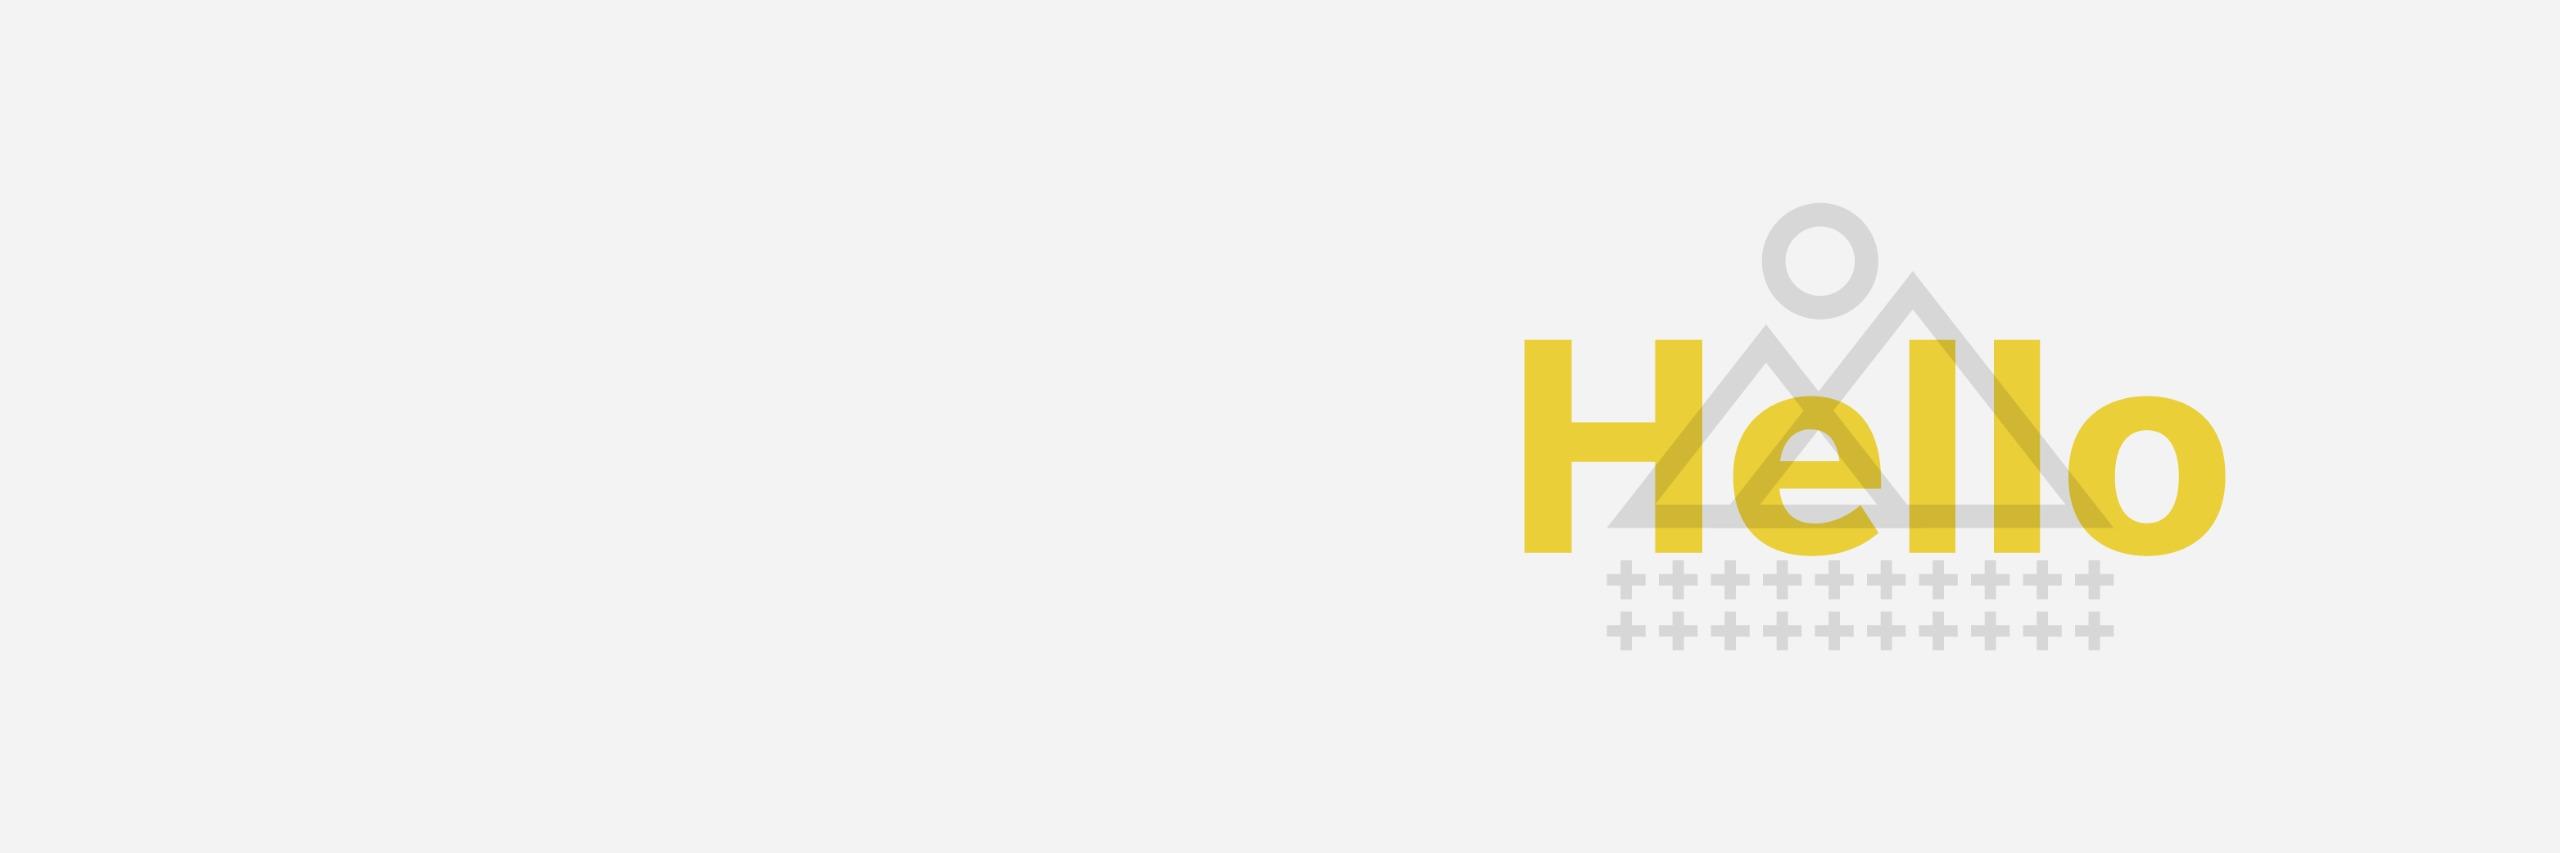 Habitat (@hellohabitat) Cover Image